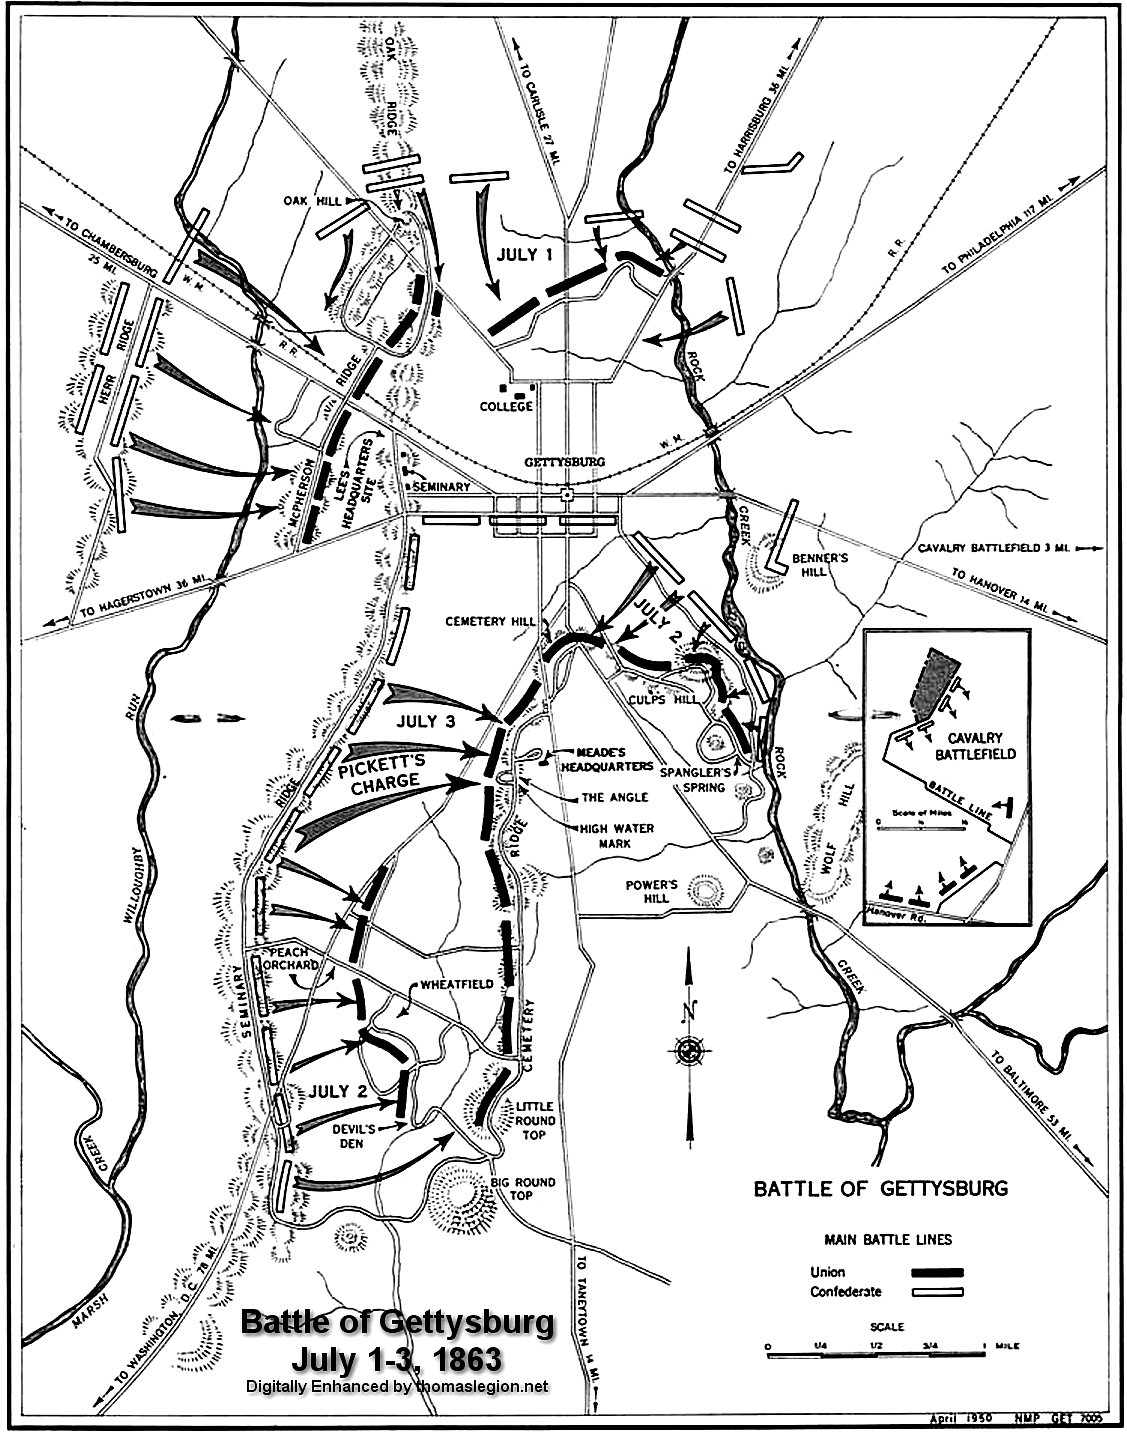 Blockade Runner Civil War Sutler Suttlery Page 8c books 12-21-18 | 1437x1127